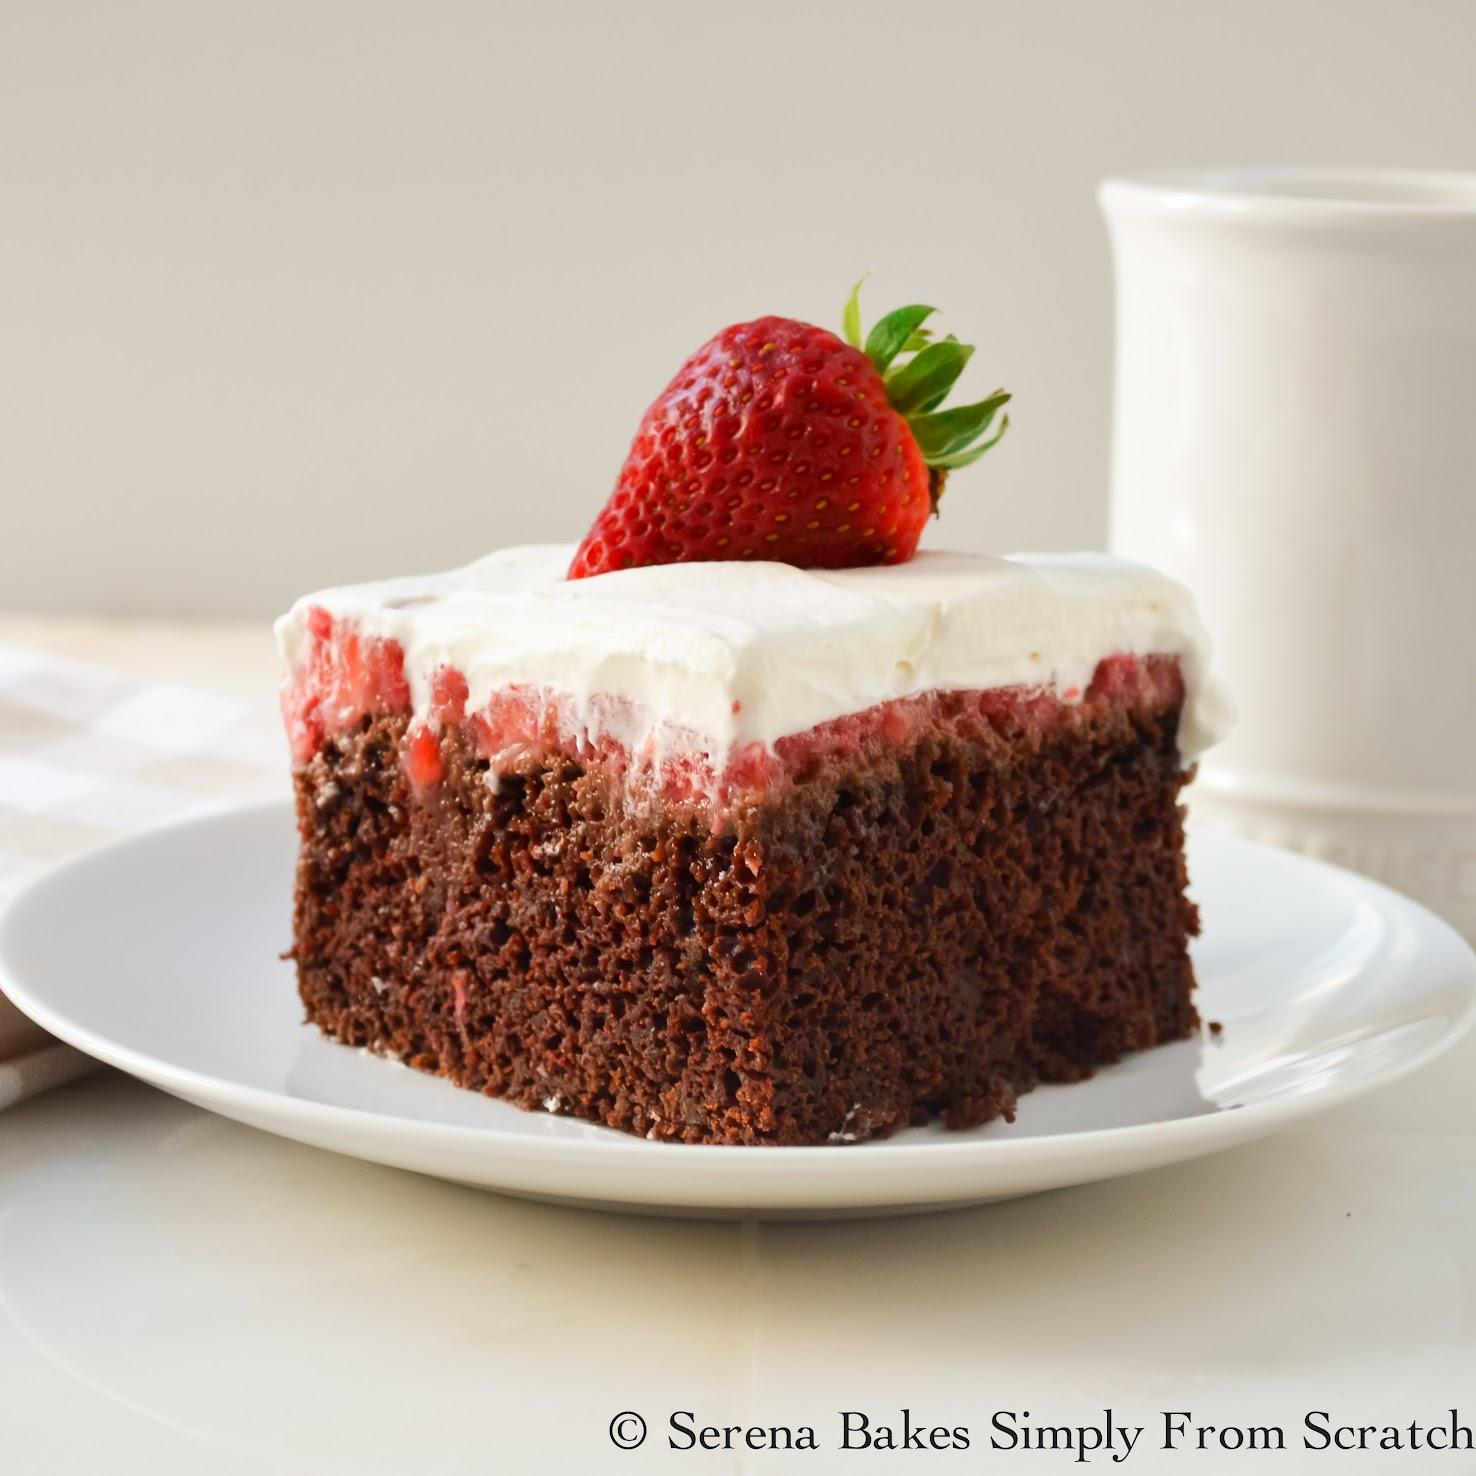 Chocolate Strawberry Poke Cake | www.serenabakessimplyfromscratch.com